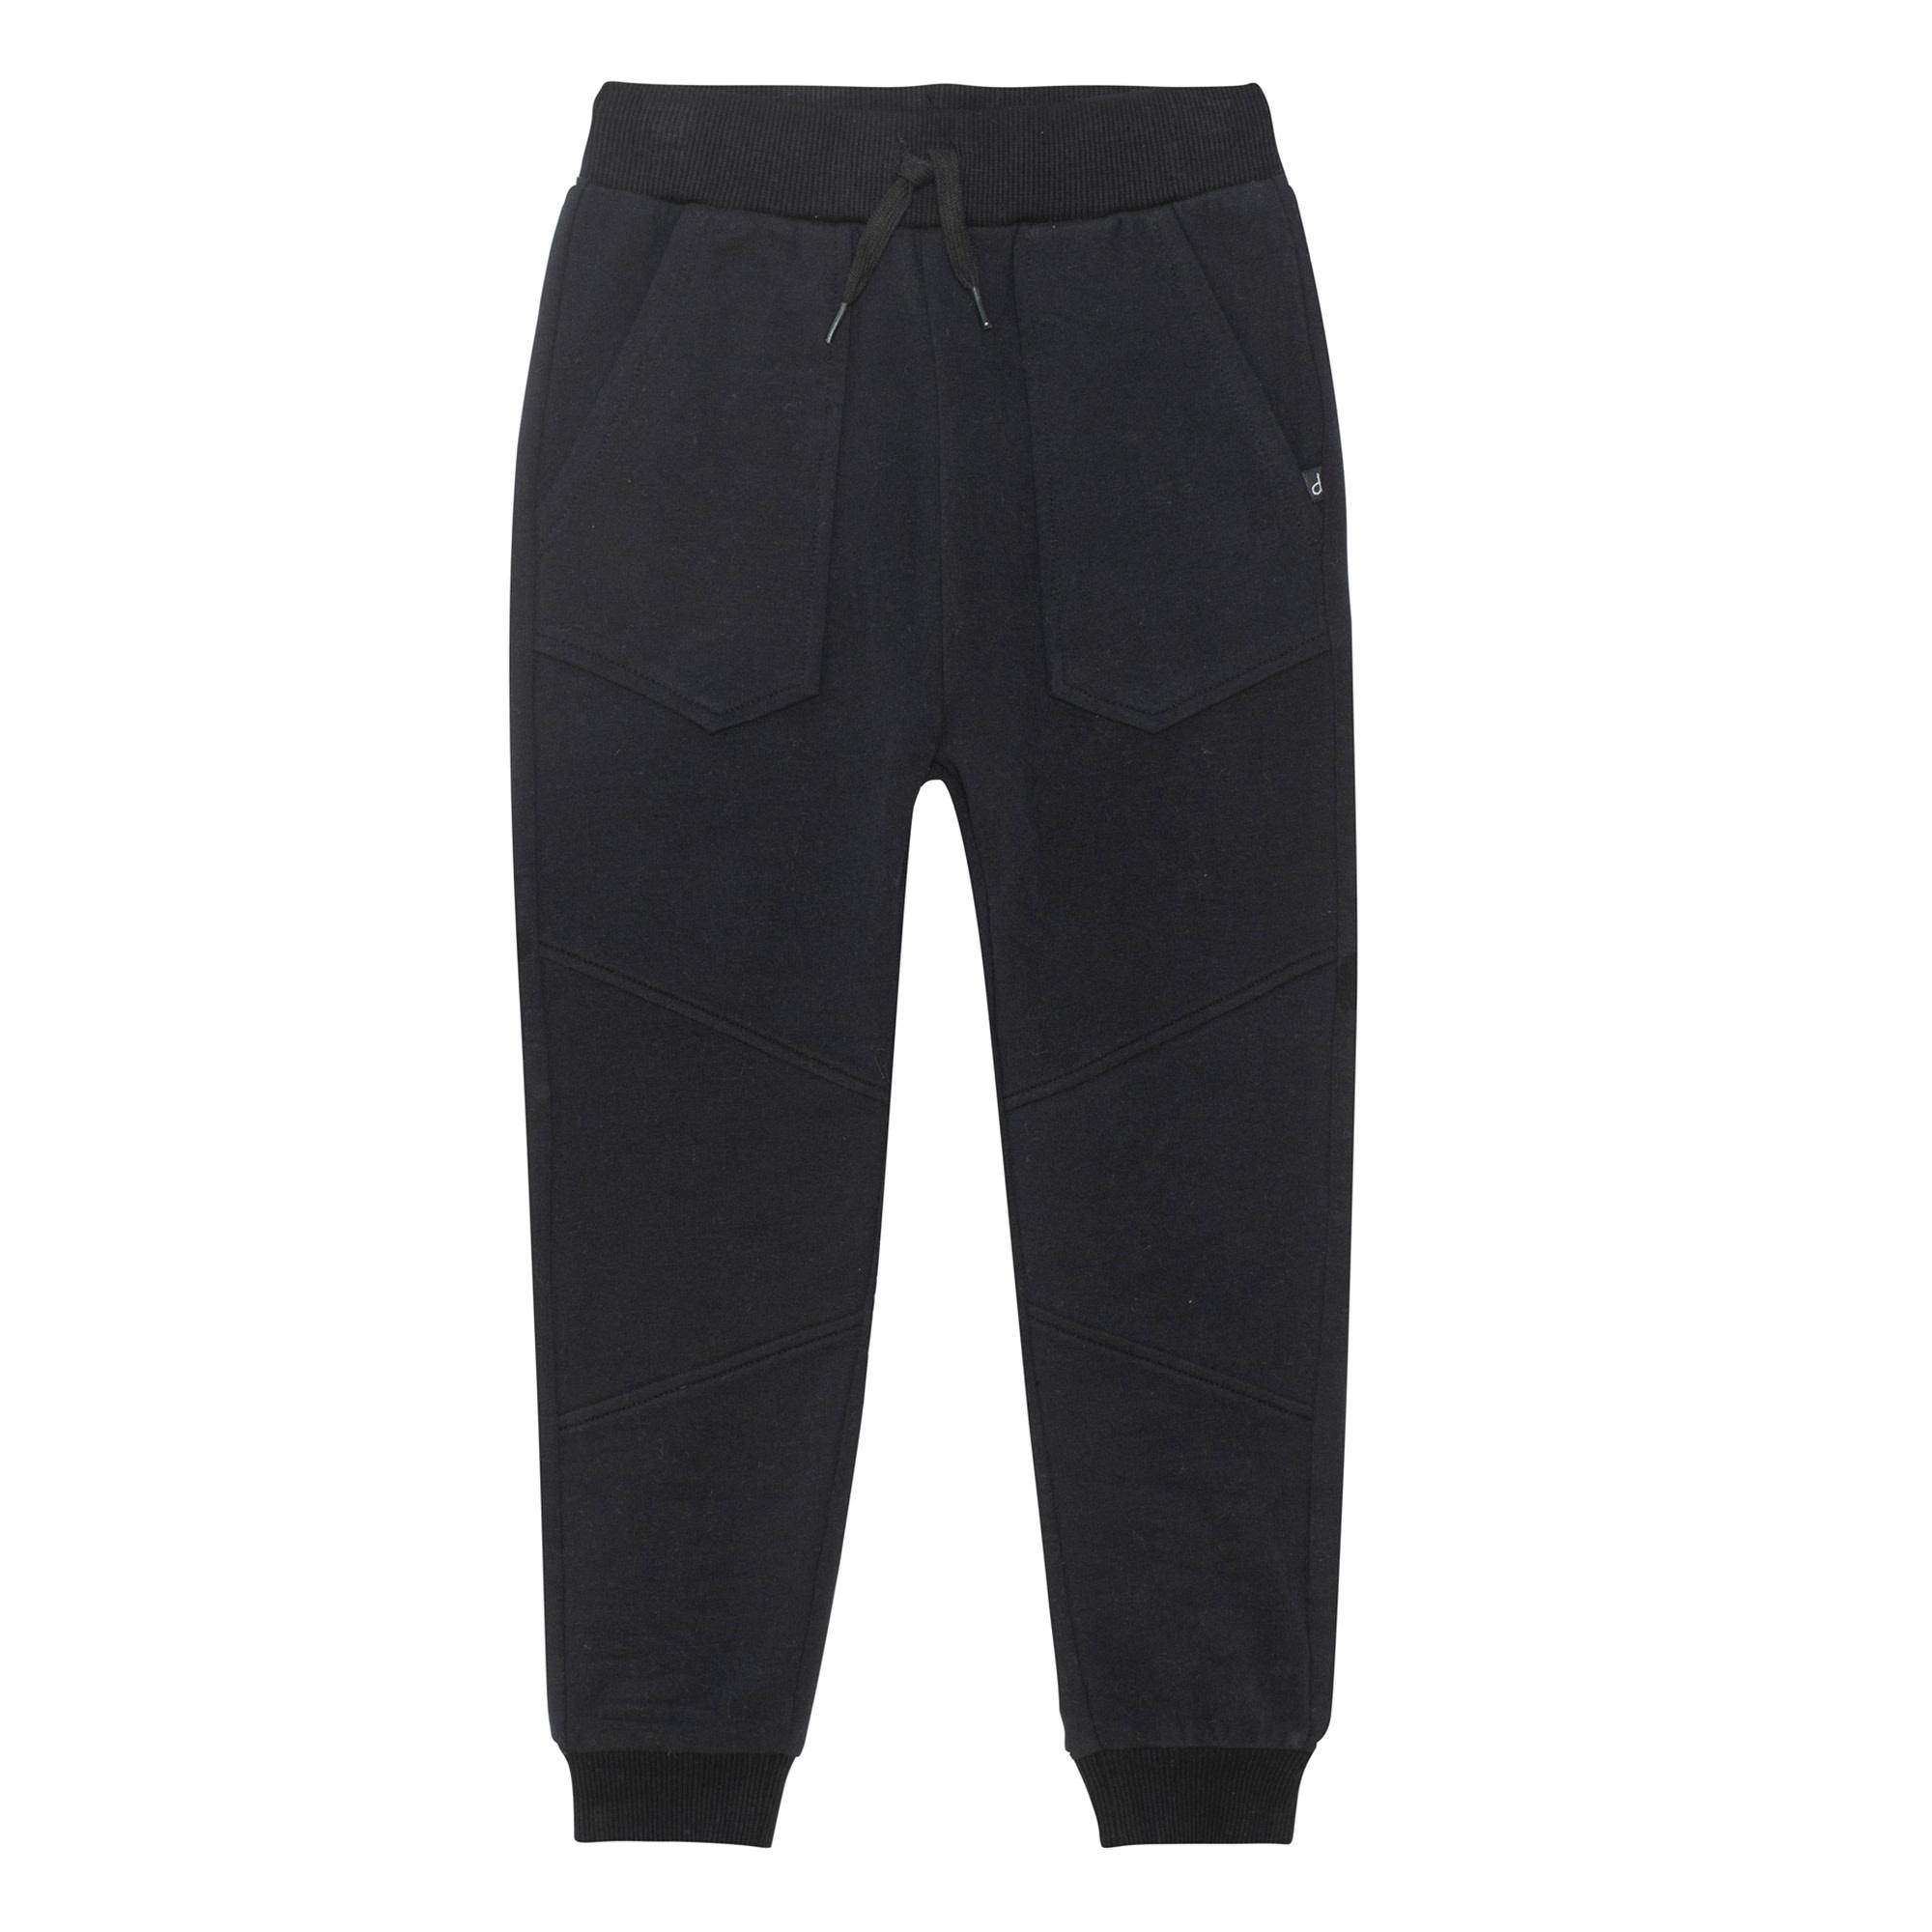 Pantalon Jogger Anthracite-6